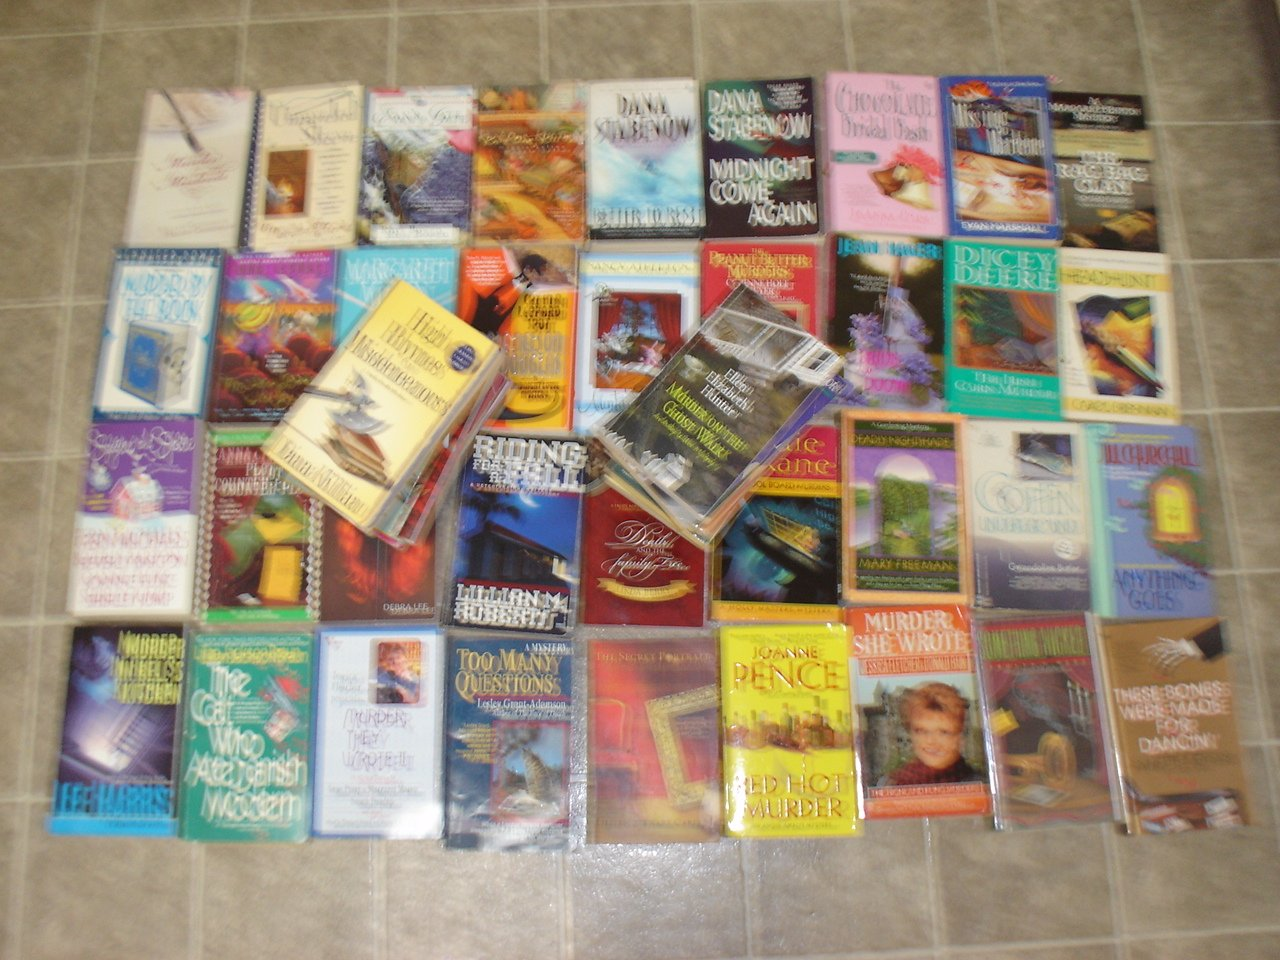 Make Your Own cozy mystery sampler lot of 5 mystery novels books #1